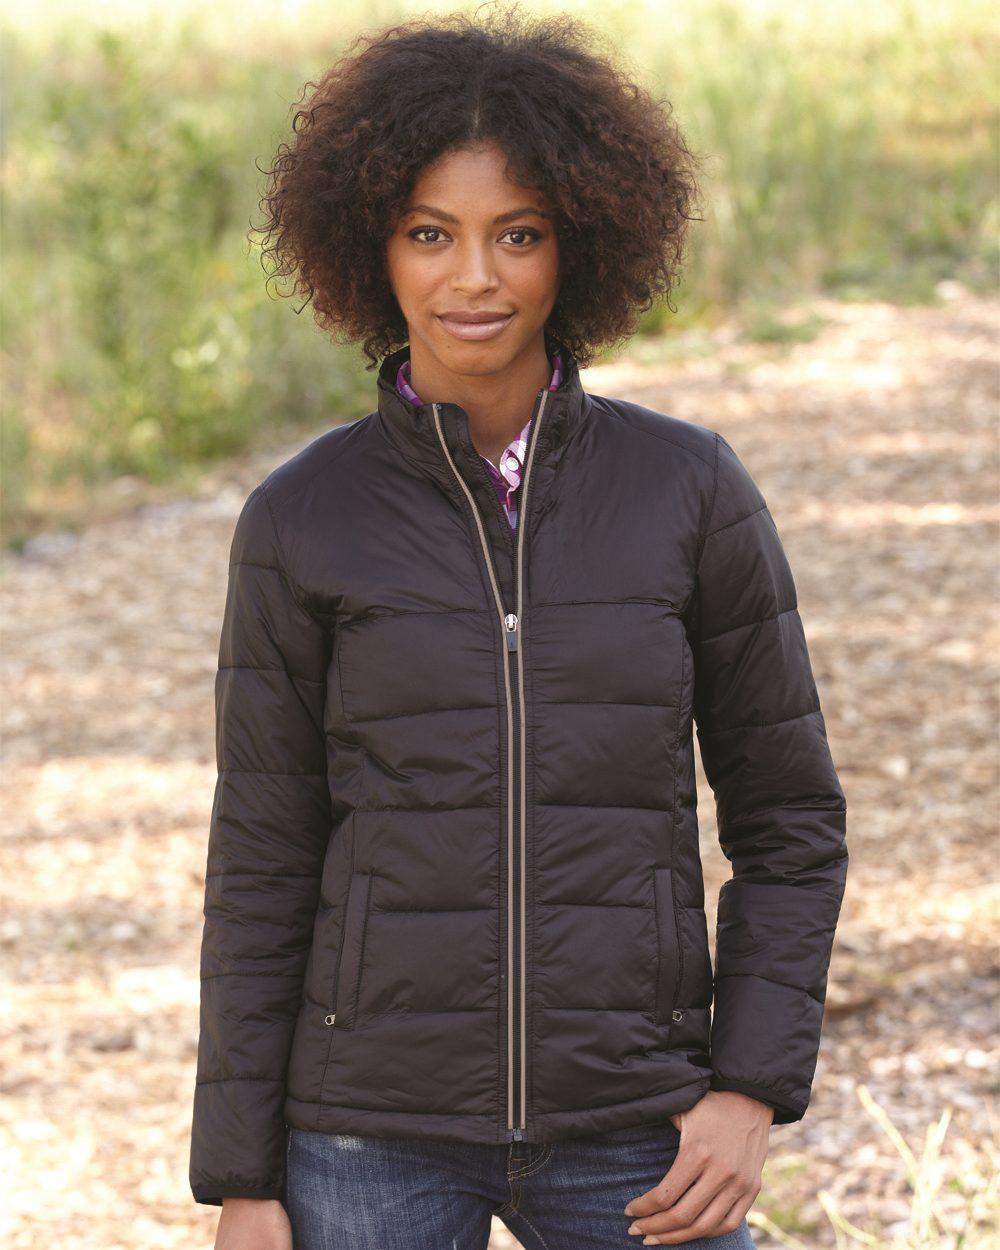 Colorado Clothing 7311 女士便携带的外套